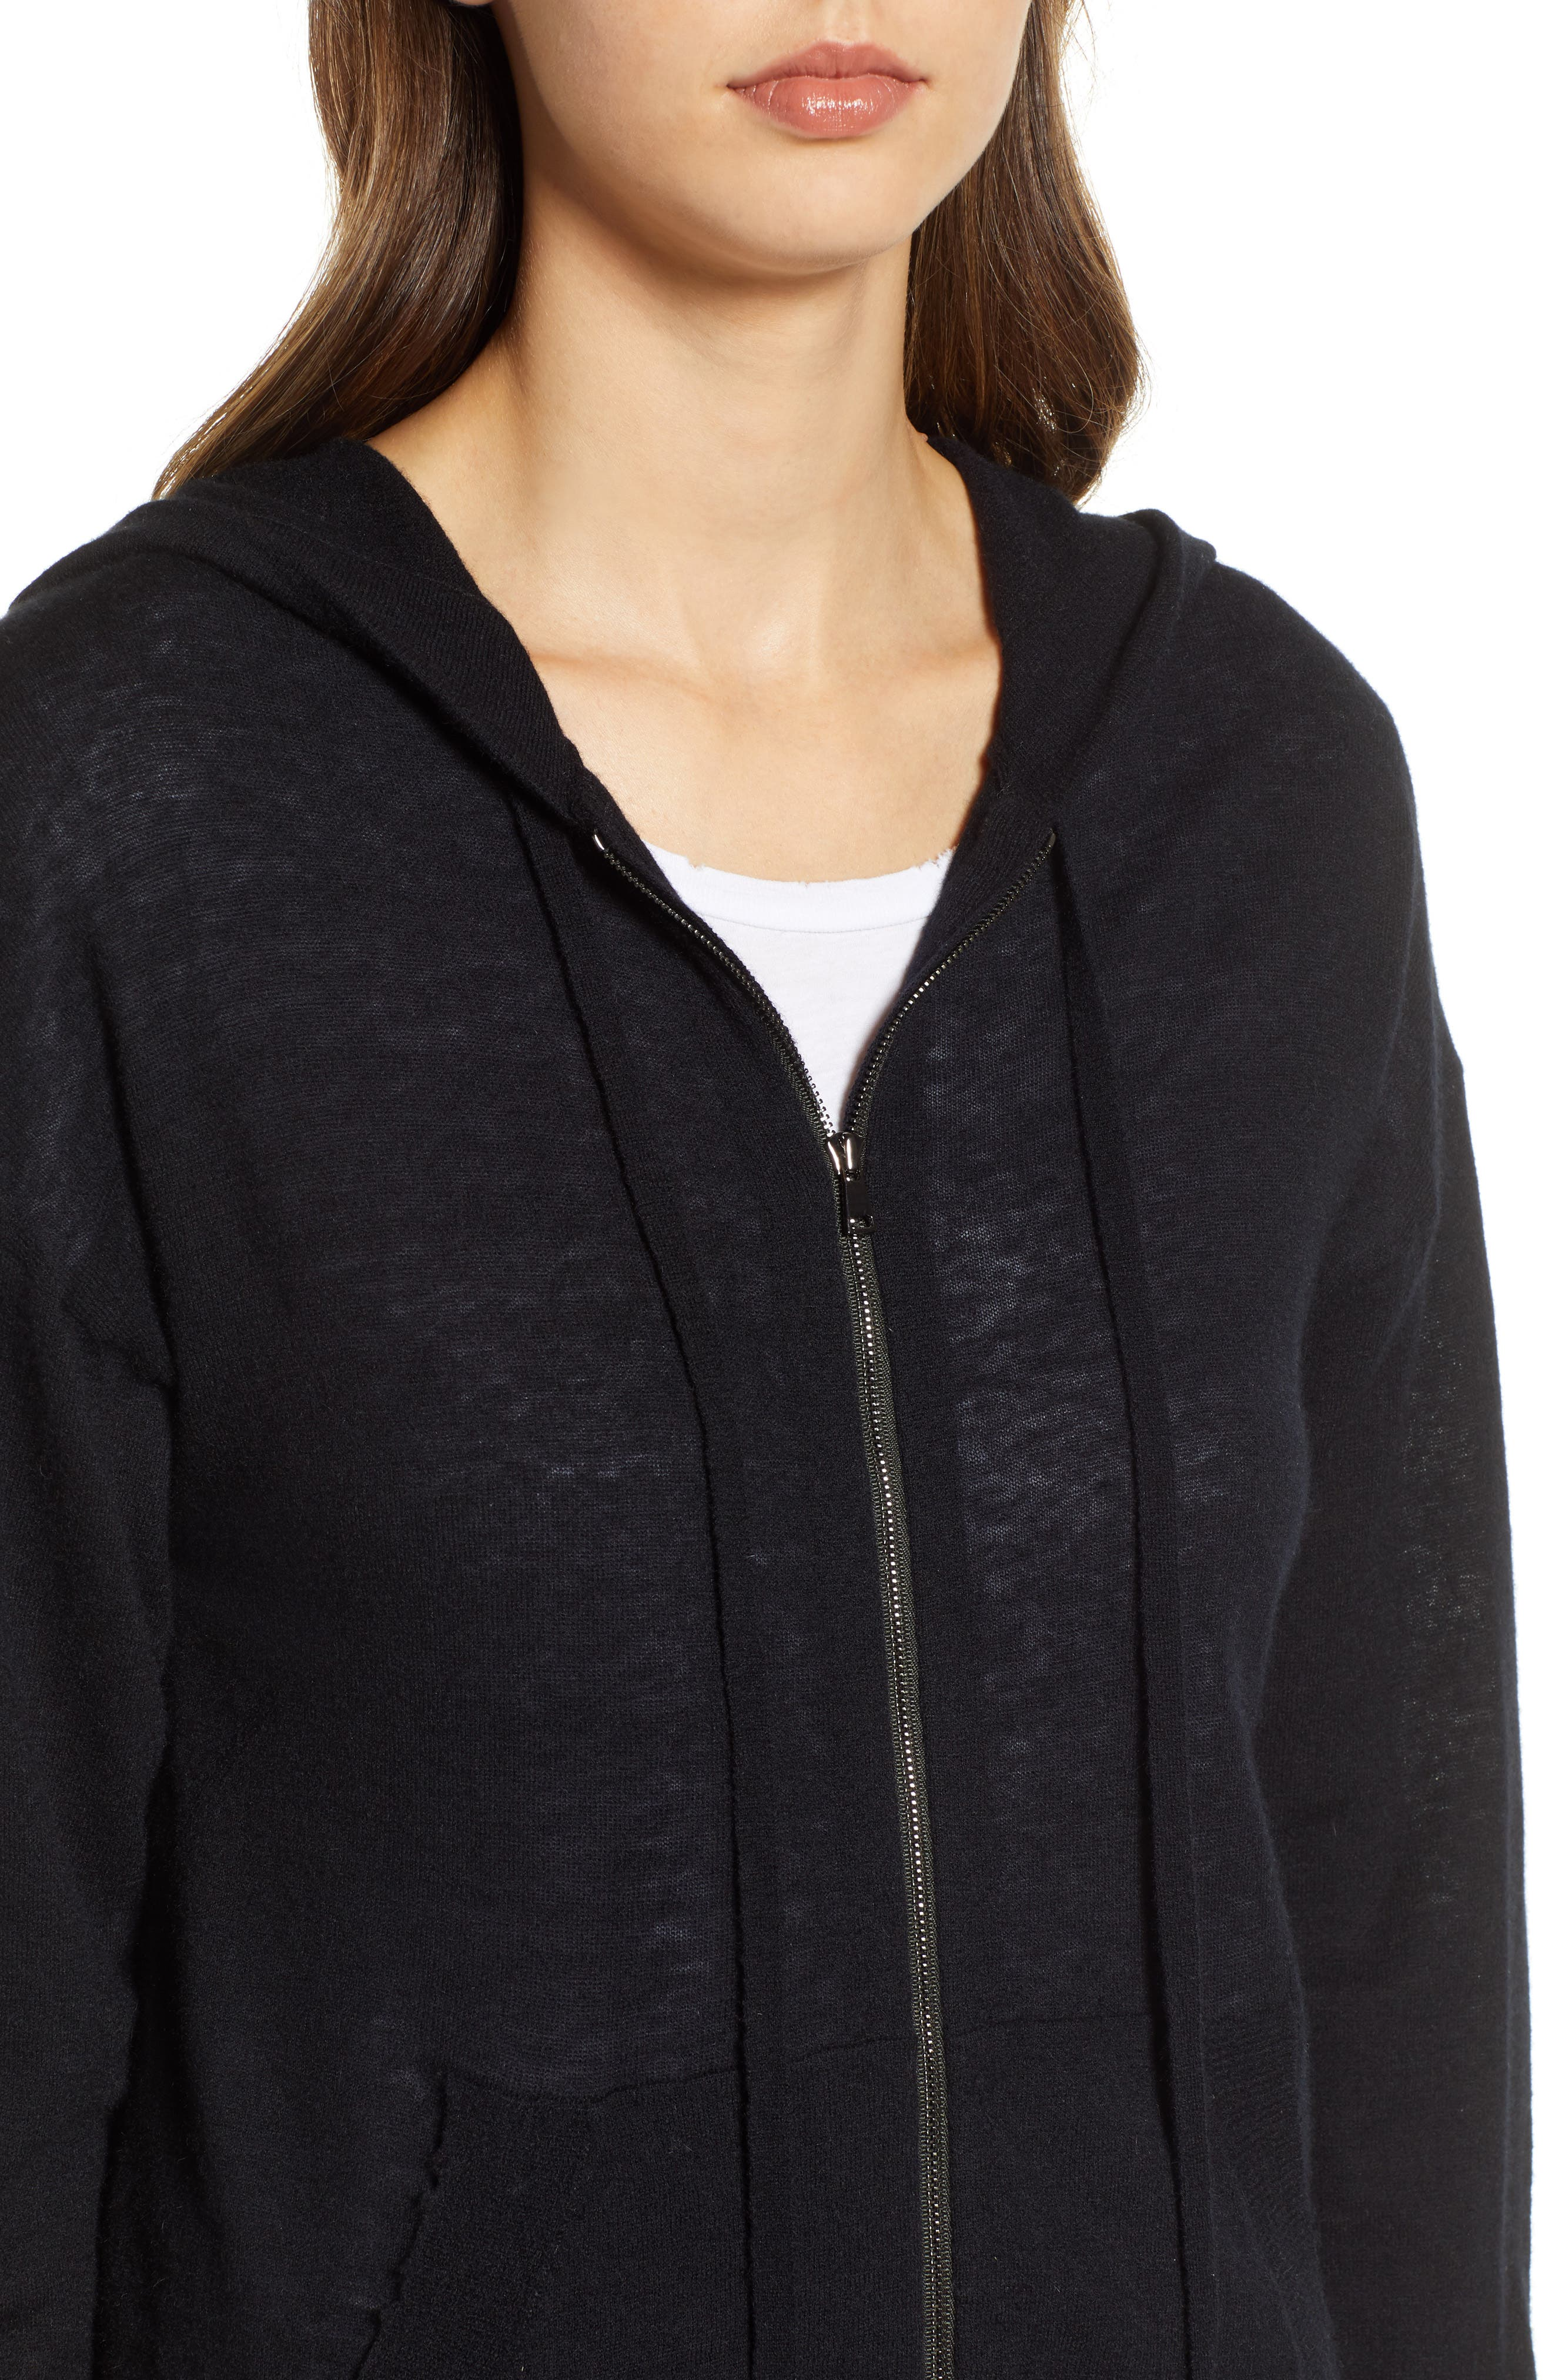 ZADIG & VOLTAIRE,                             Sixtine Bis Cashmere Zip Sweater Hoodie,                             Alternate thumbnail 4, color,                             001